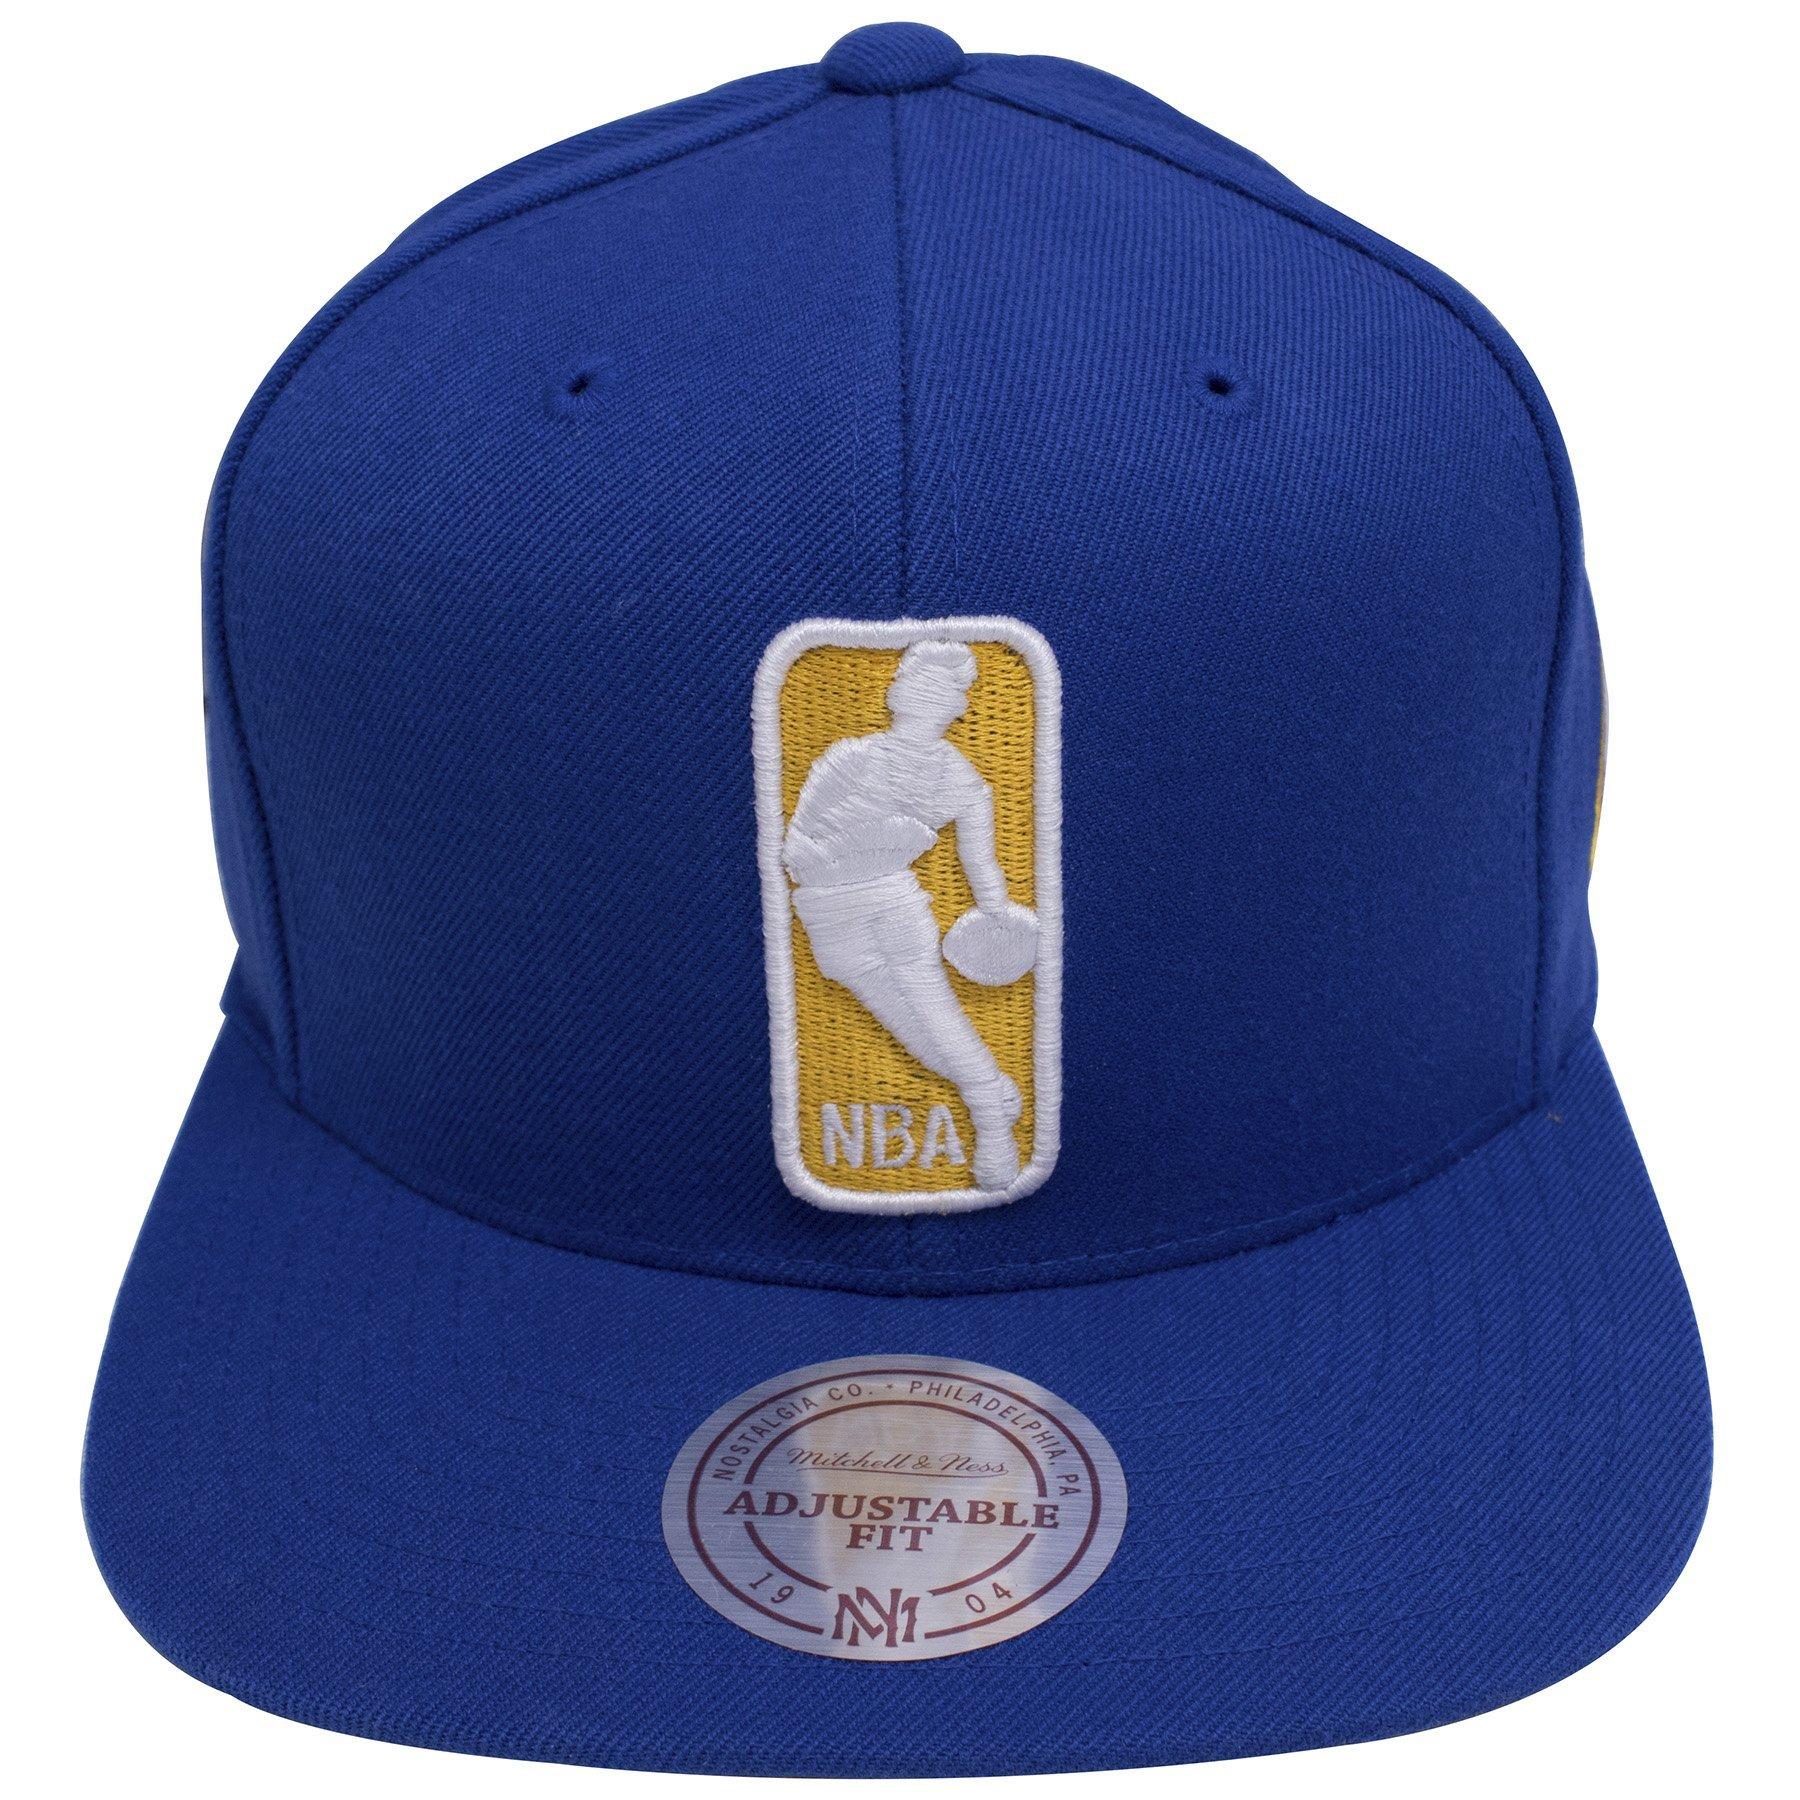 Golden State Warriors NBA Logo Team Colorway Blue Snapback Hat.